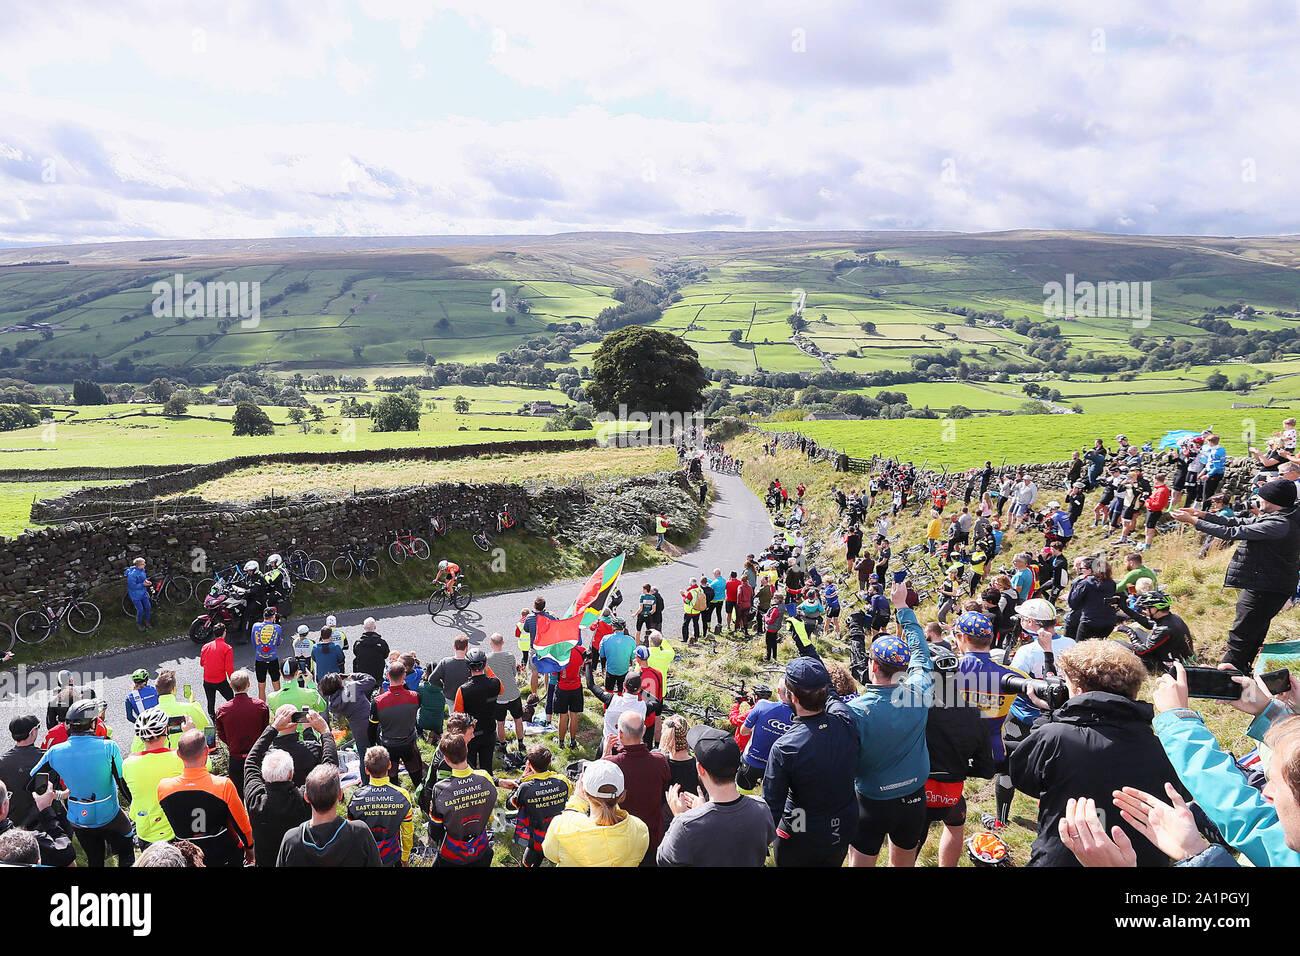 Harrogate, UK. 28th Sep, 2019. HARROGATE, 29-09-2019, cycling, wk wielrennen, worldchampionships, women, Annemiek van Vleuten attacks early Credit: Pro Shots/Alamy Live News Stock Photo